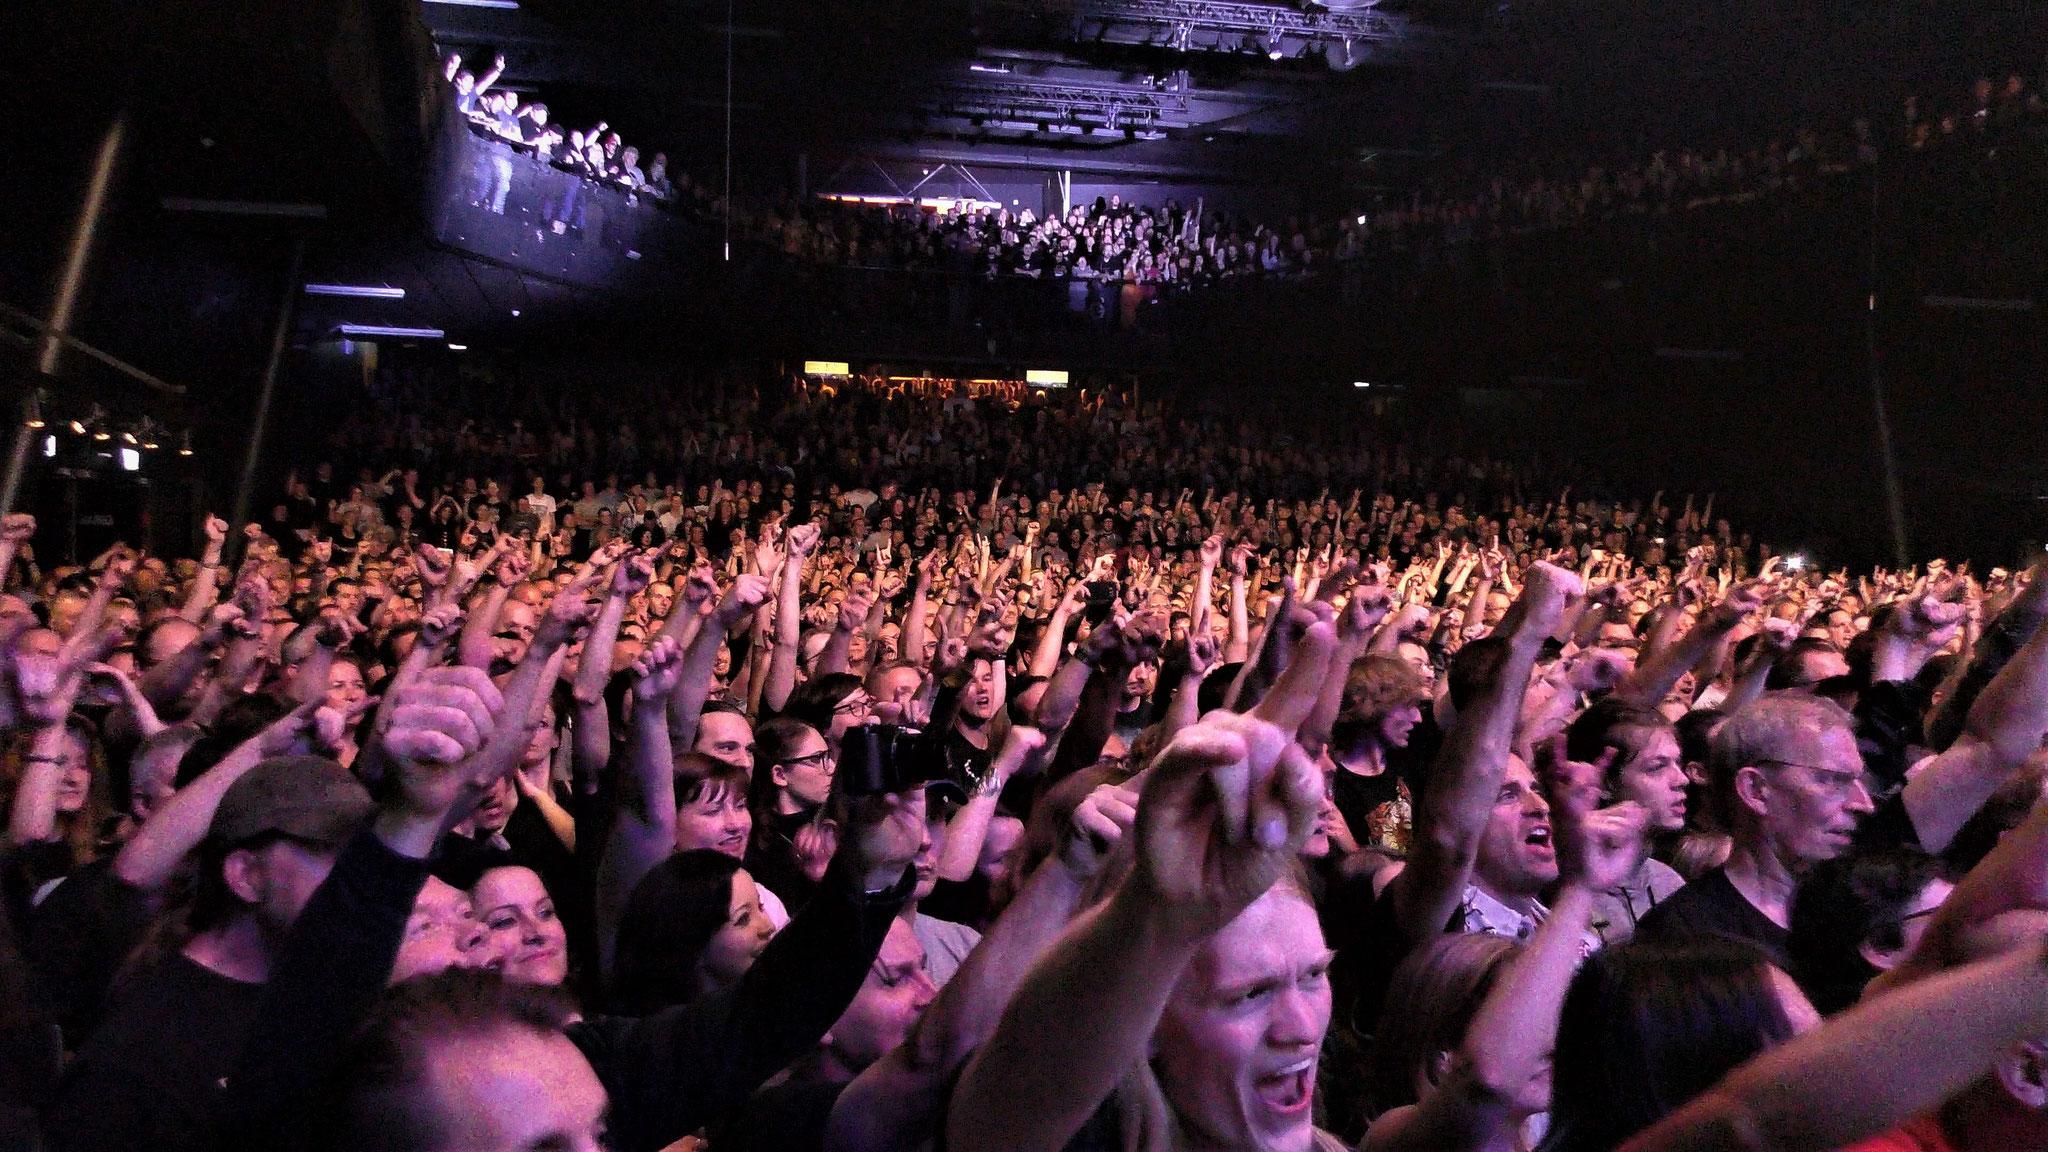 Ayreon Universe 013 audience